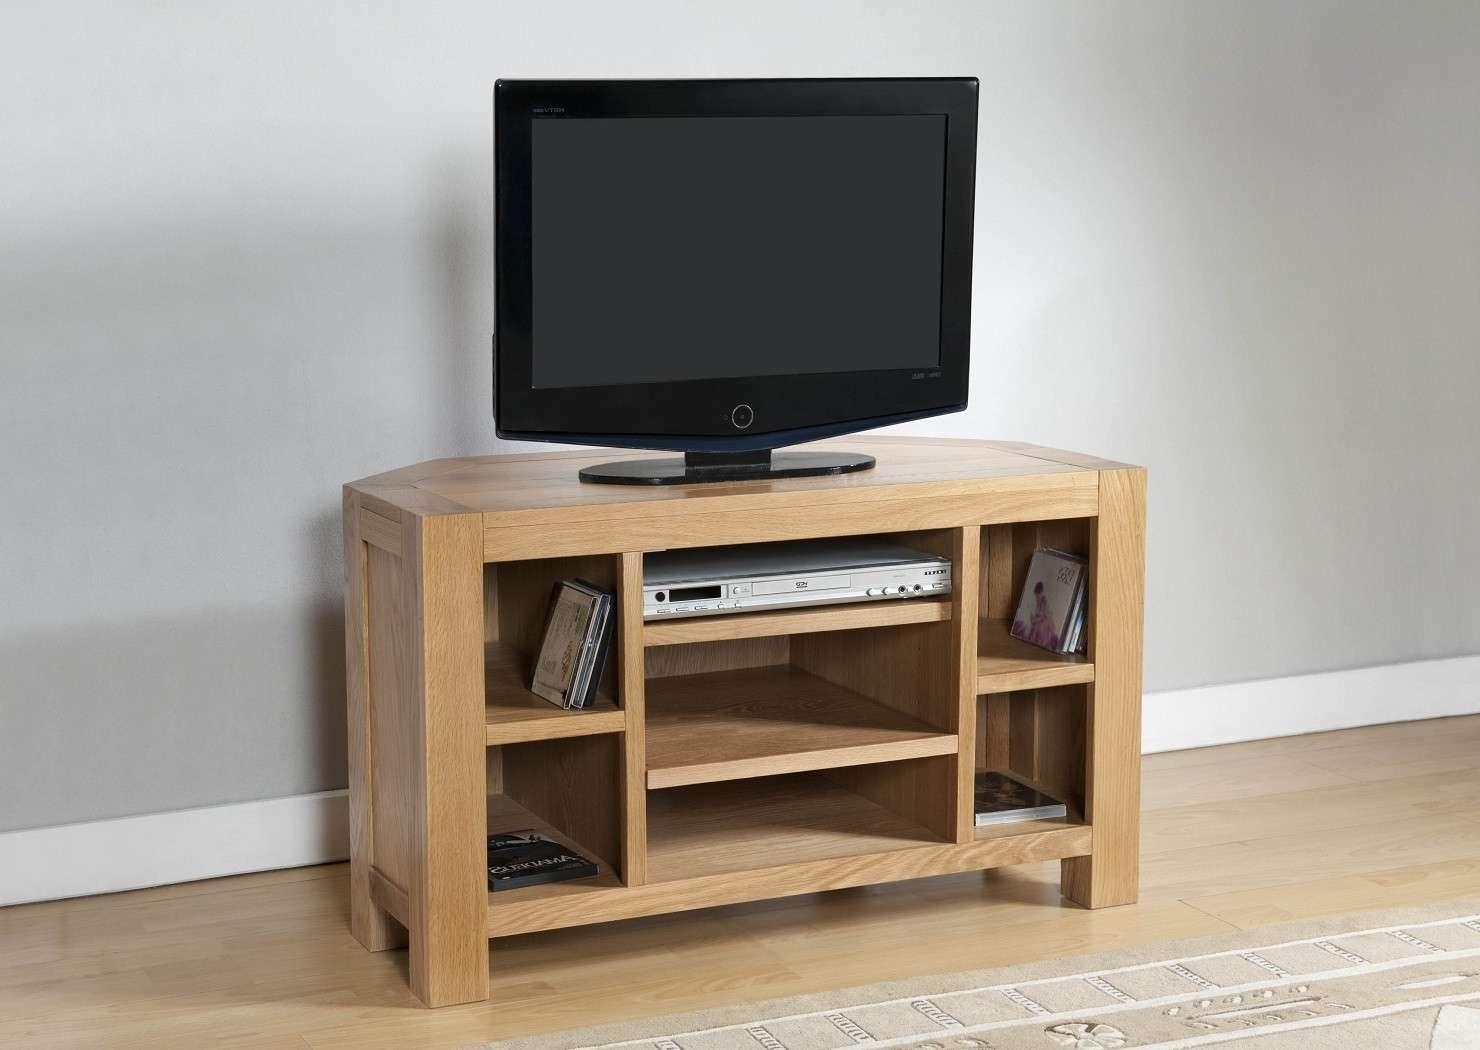 Aylesbury Contemporary Light Oak Corner Tv Unit   Oak Furniture Uk For Light Oak Corner Tv Cabinets (View 4 of 20)